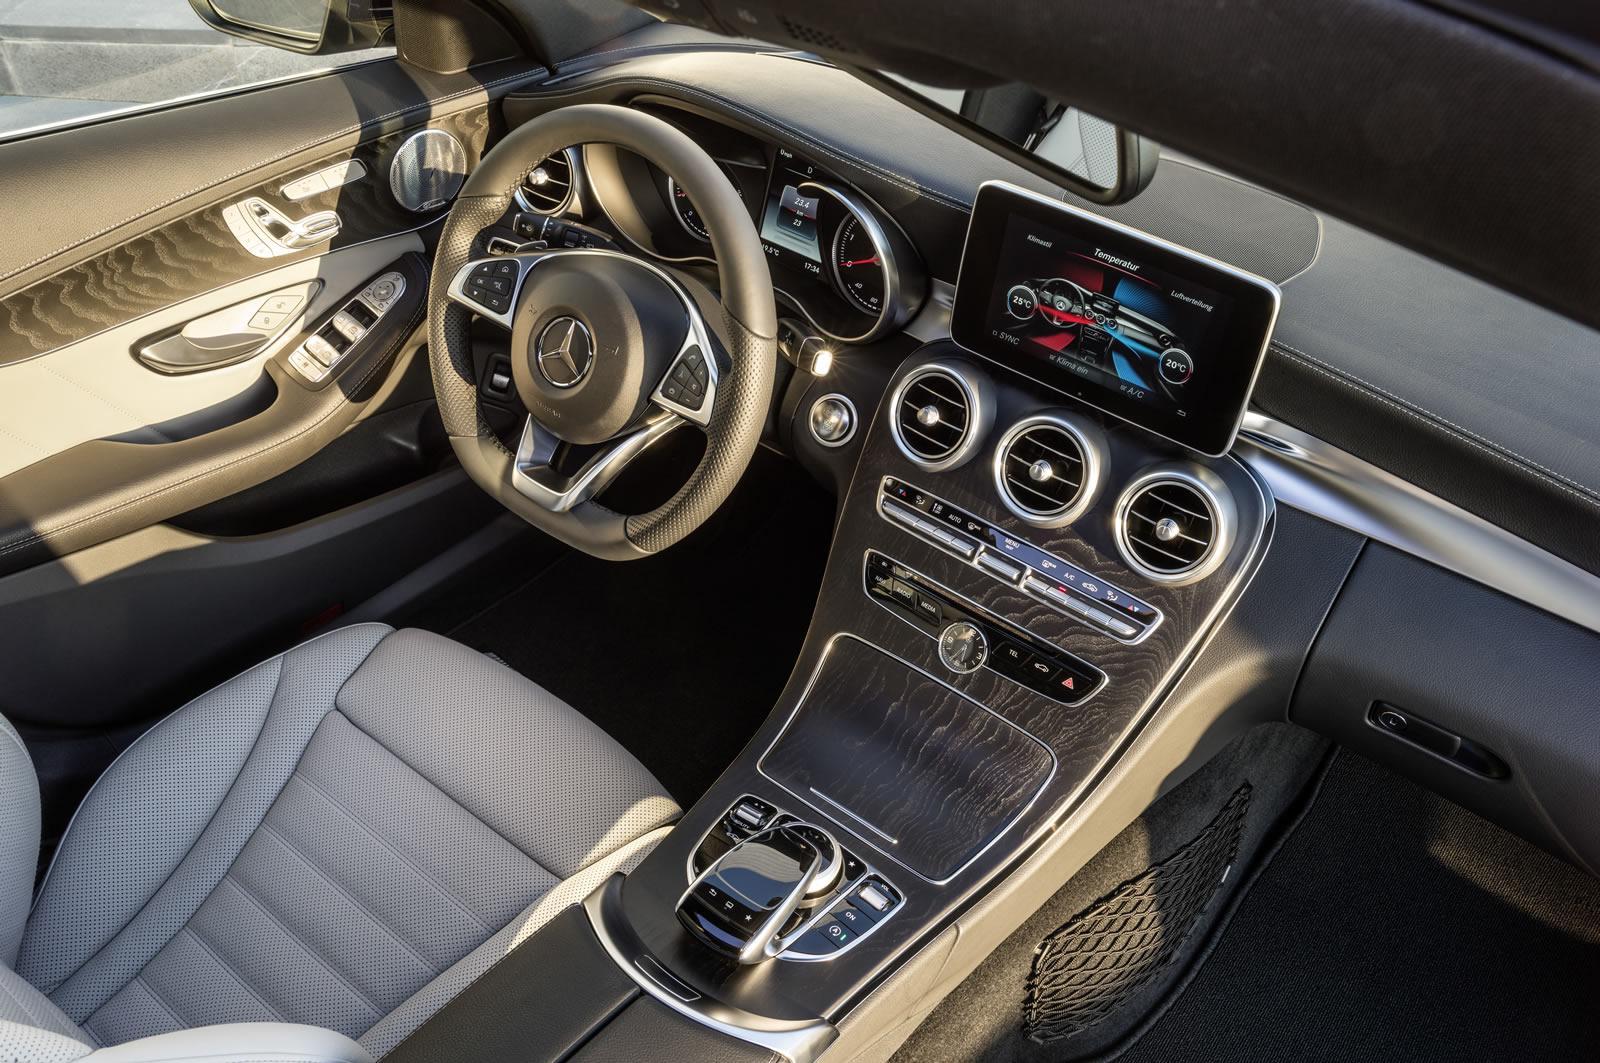 Mercedes clase c estate 2014 precios motores equipamientos for Interior mercedes clase c